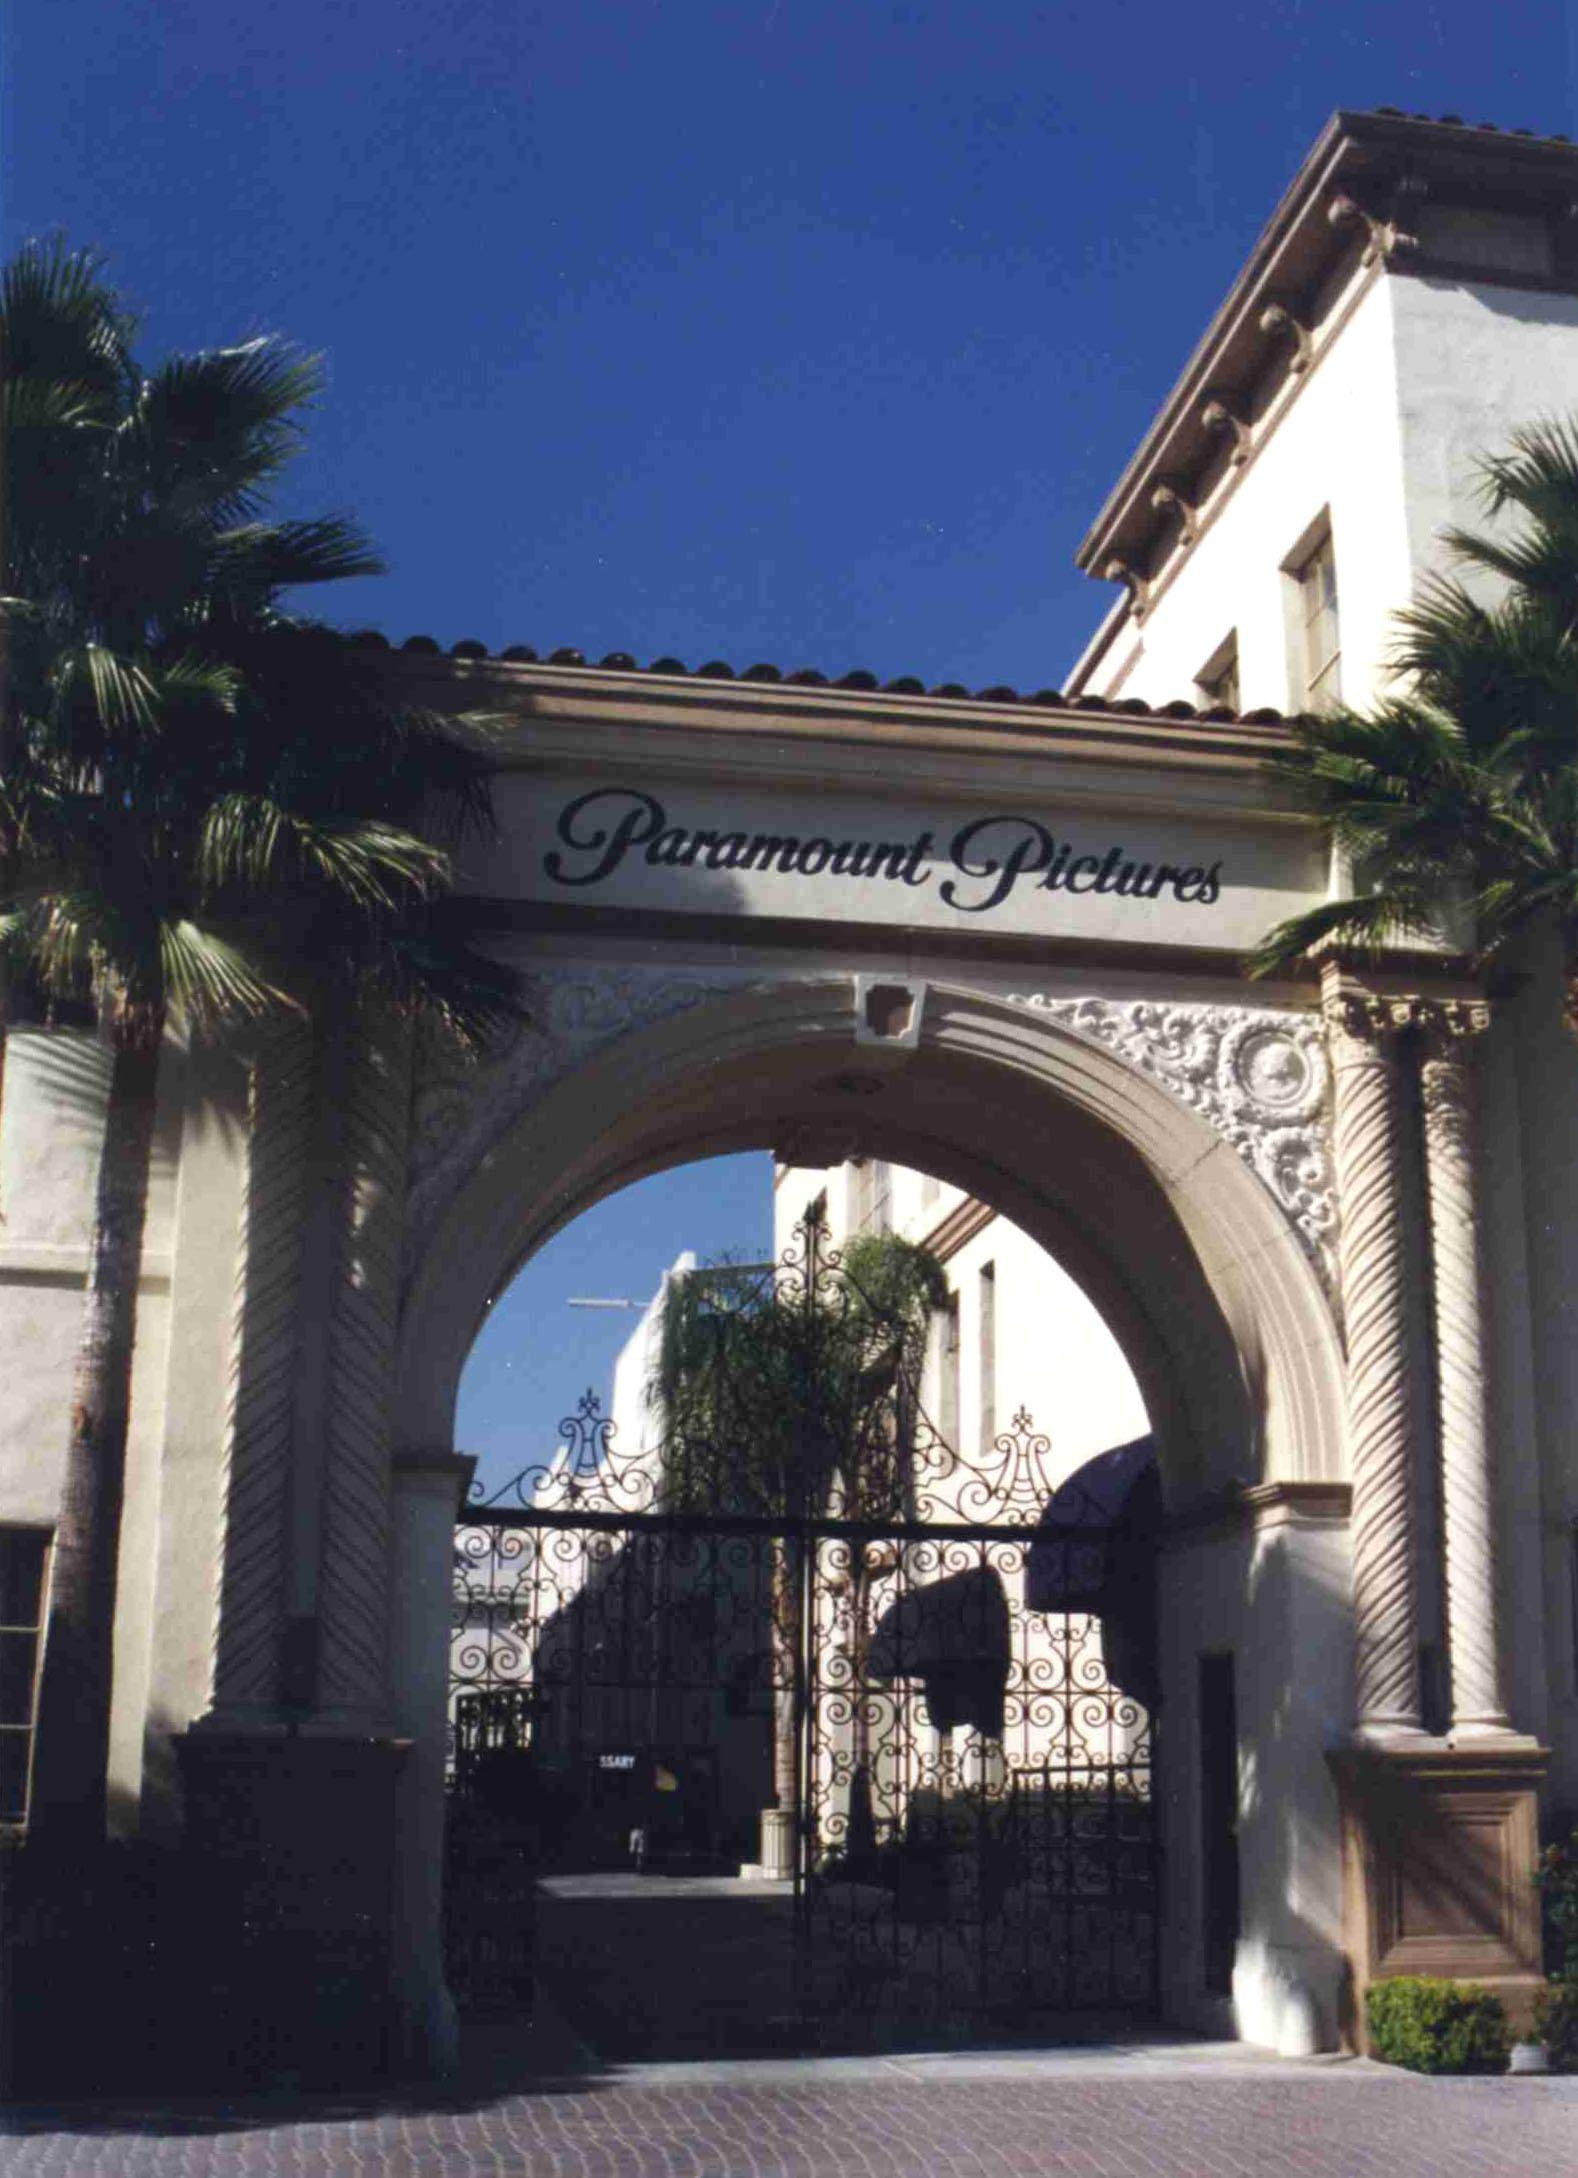 Paramount Pictures википедия